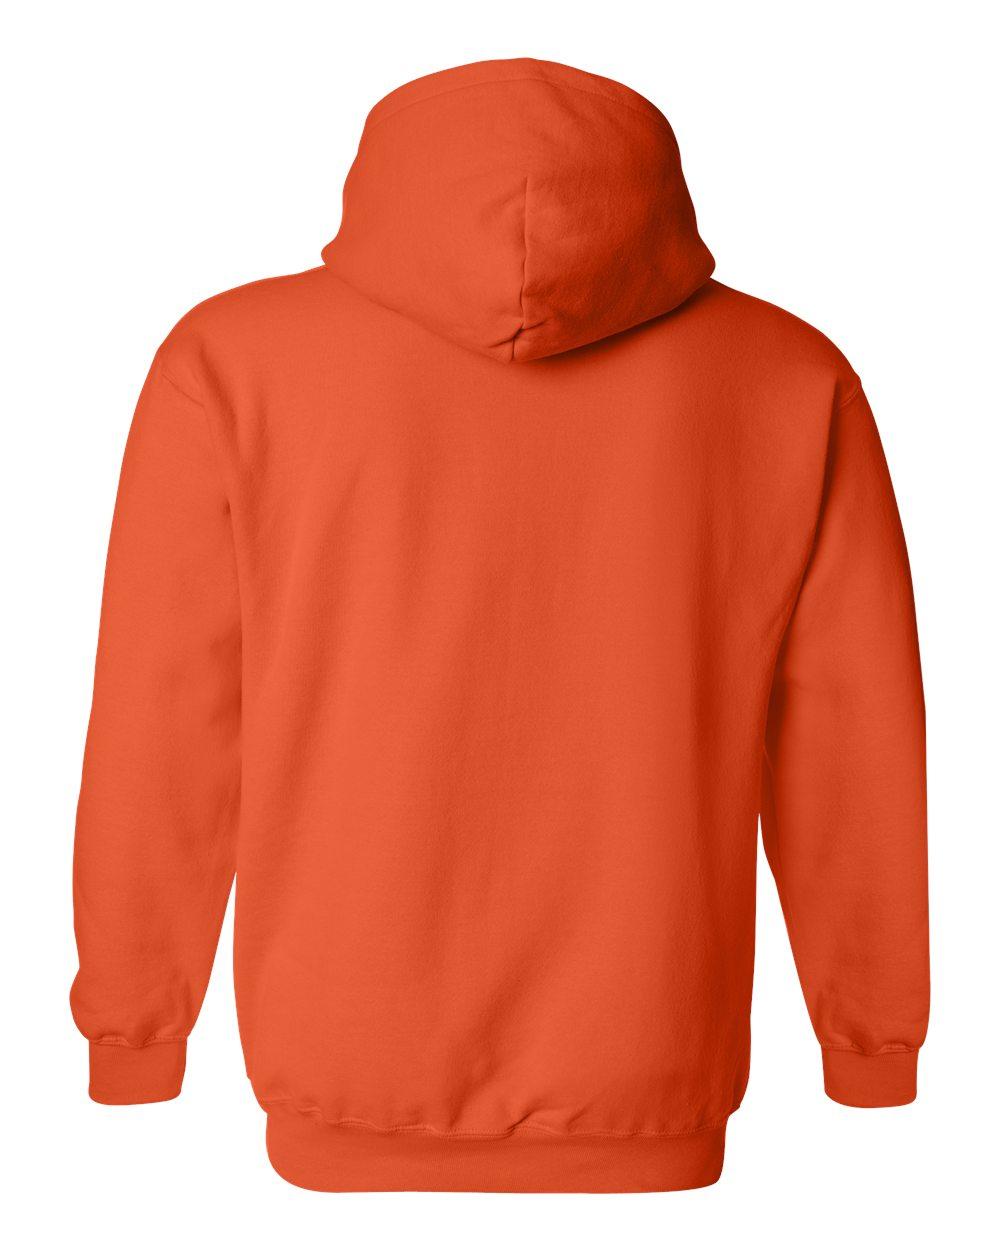 Gildan-Mens-Blank-Hoodie-Heavy-Blend-Hooded-Sweatshirt-18500-up-to-5XL thumbnail 37